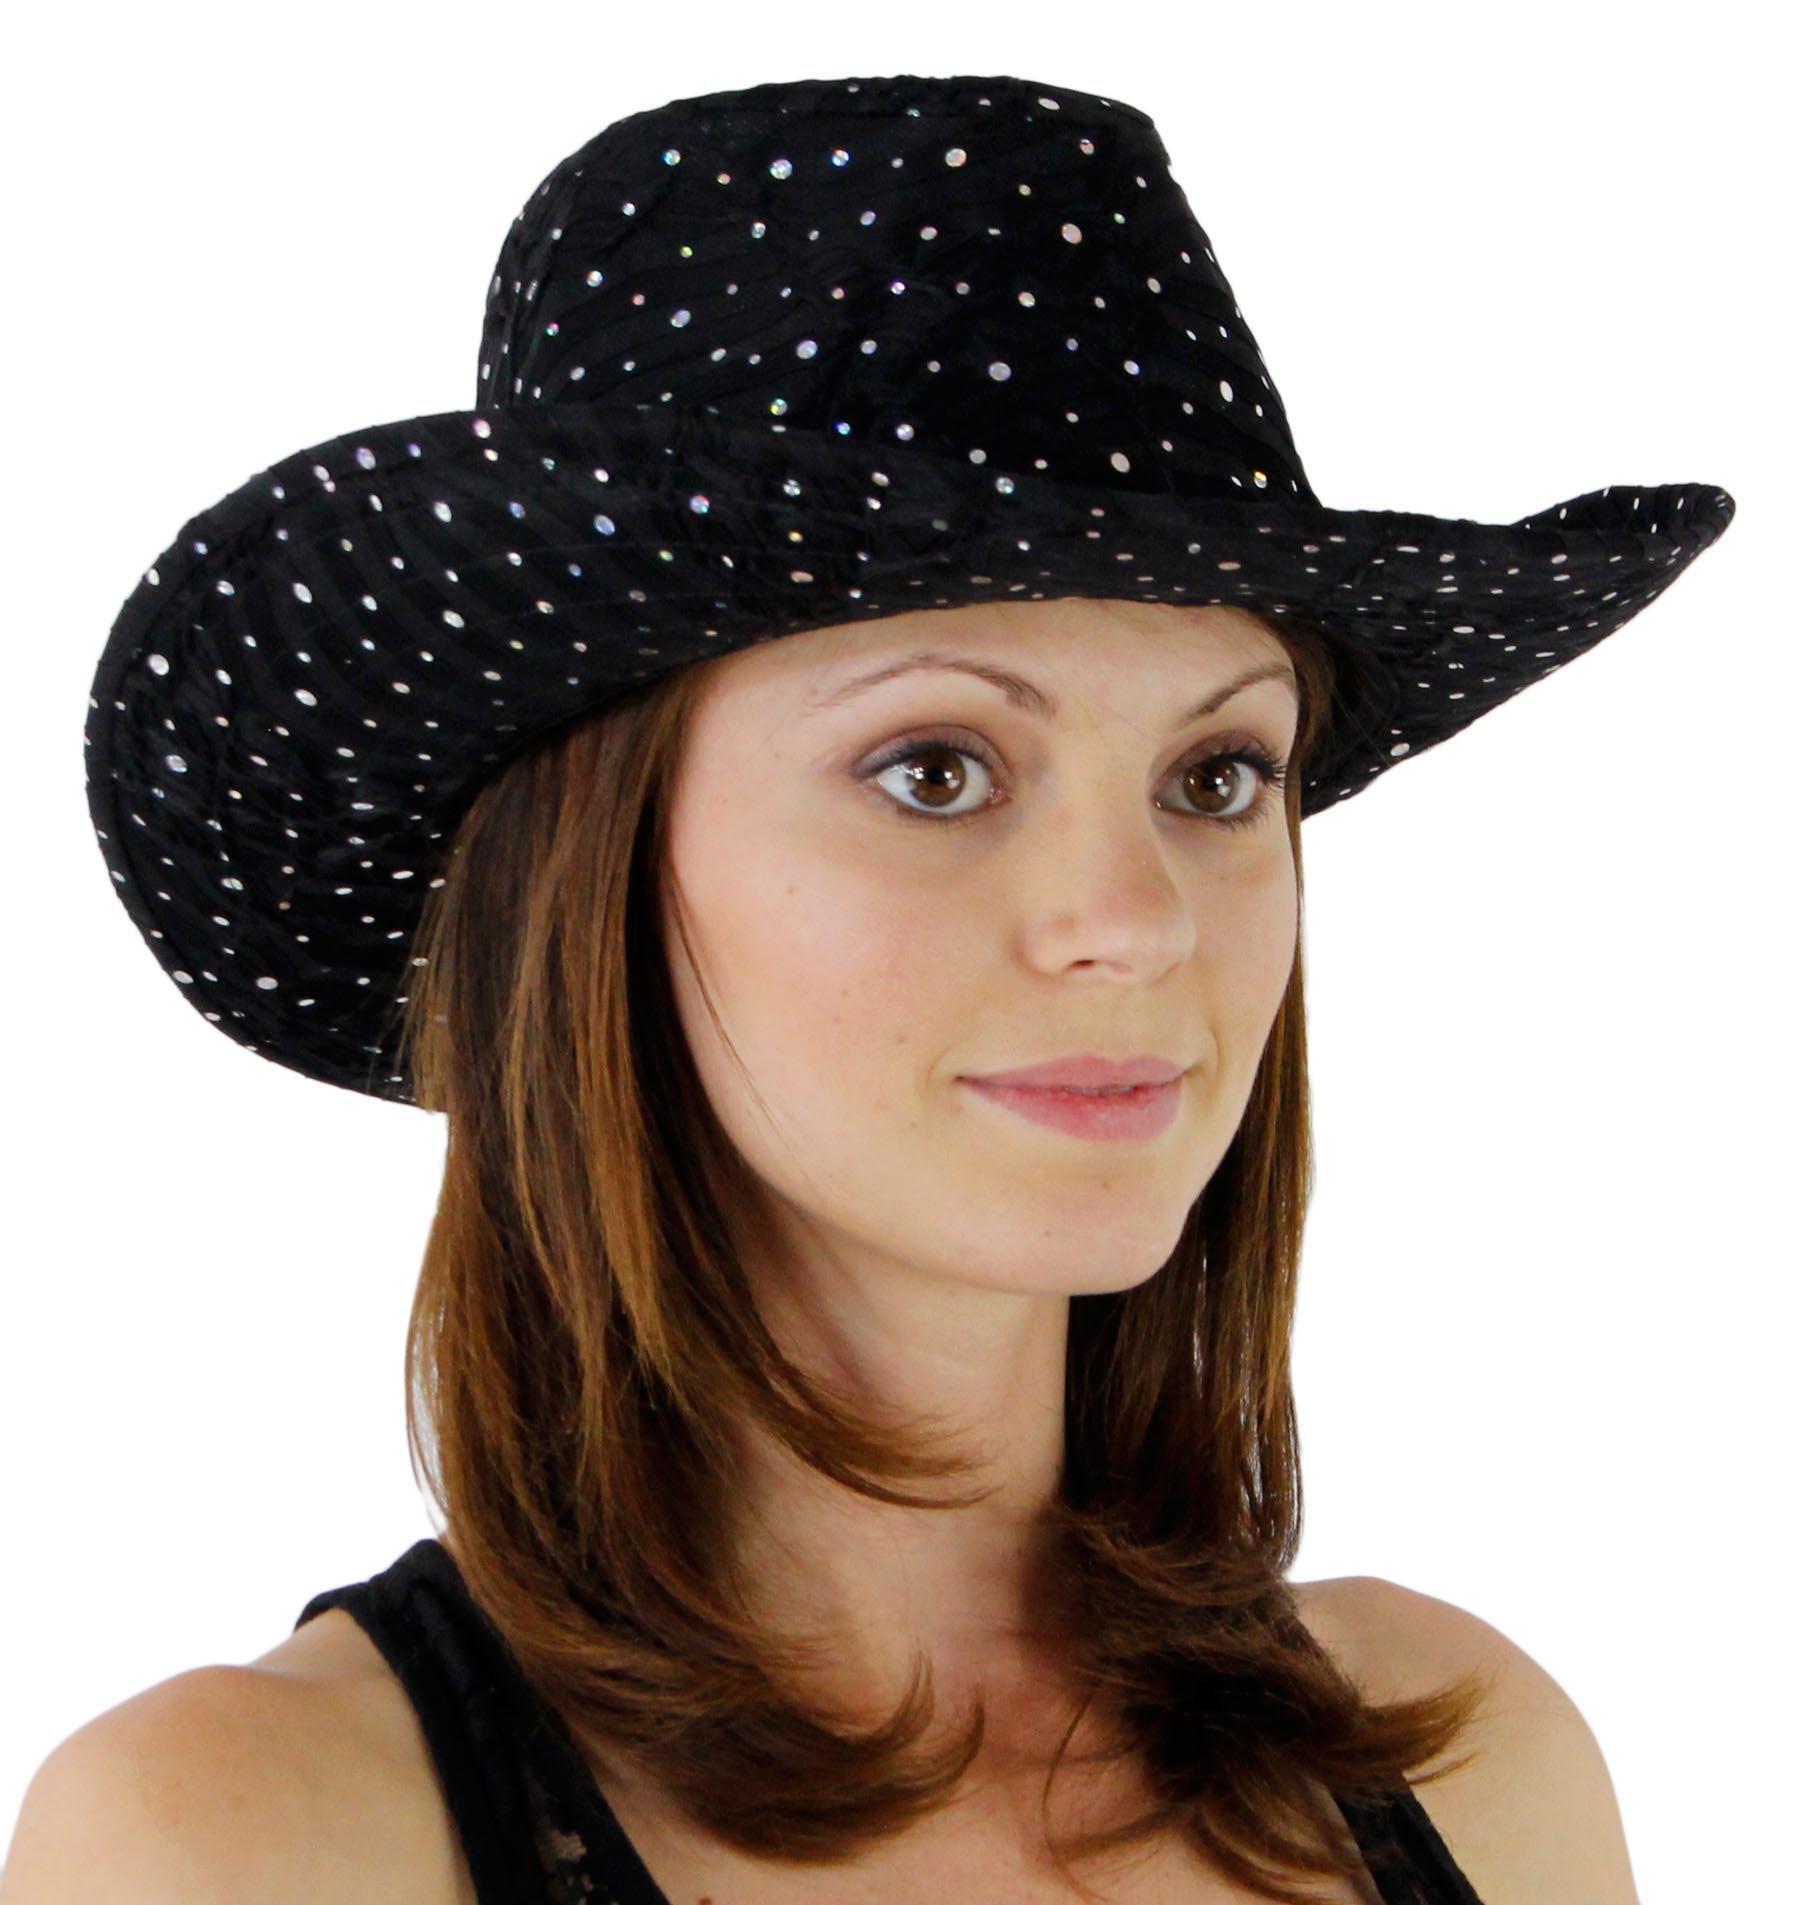 Glitter Sequin Trim Cowboy Hat Black One Size